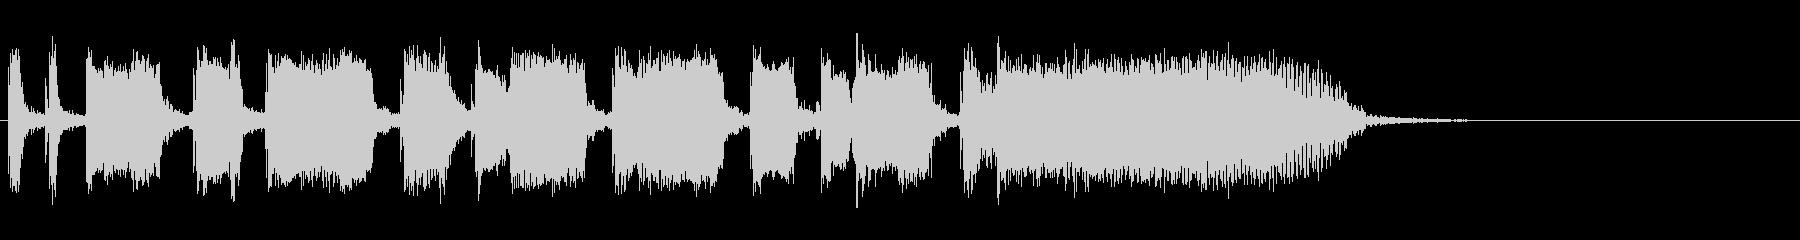 Guitarジングル1/カッティングの未再生の波形